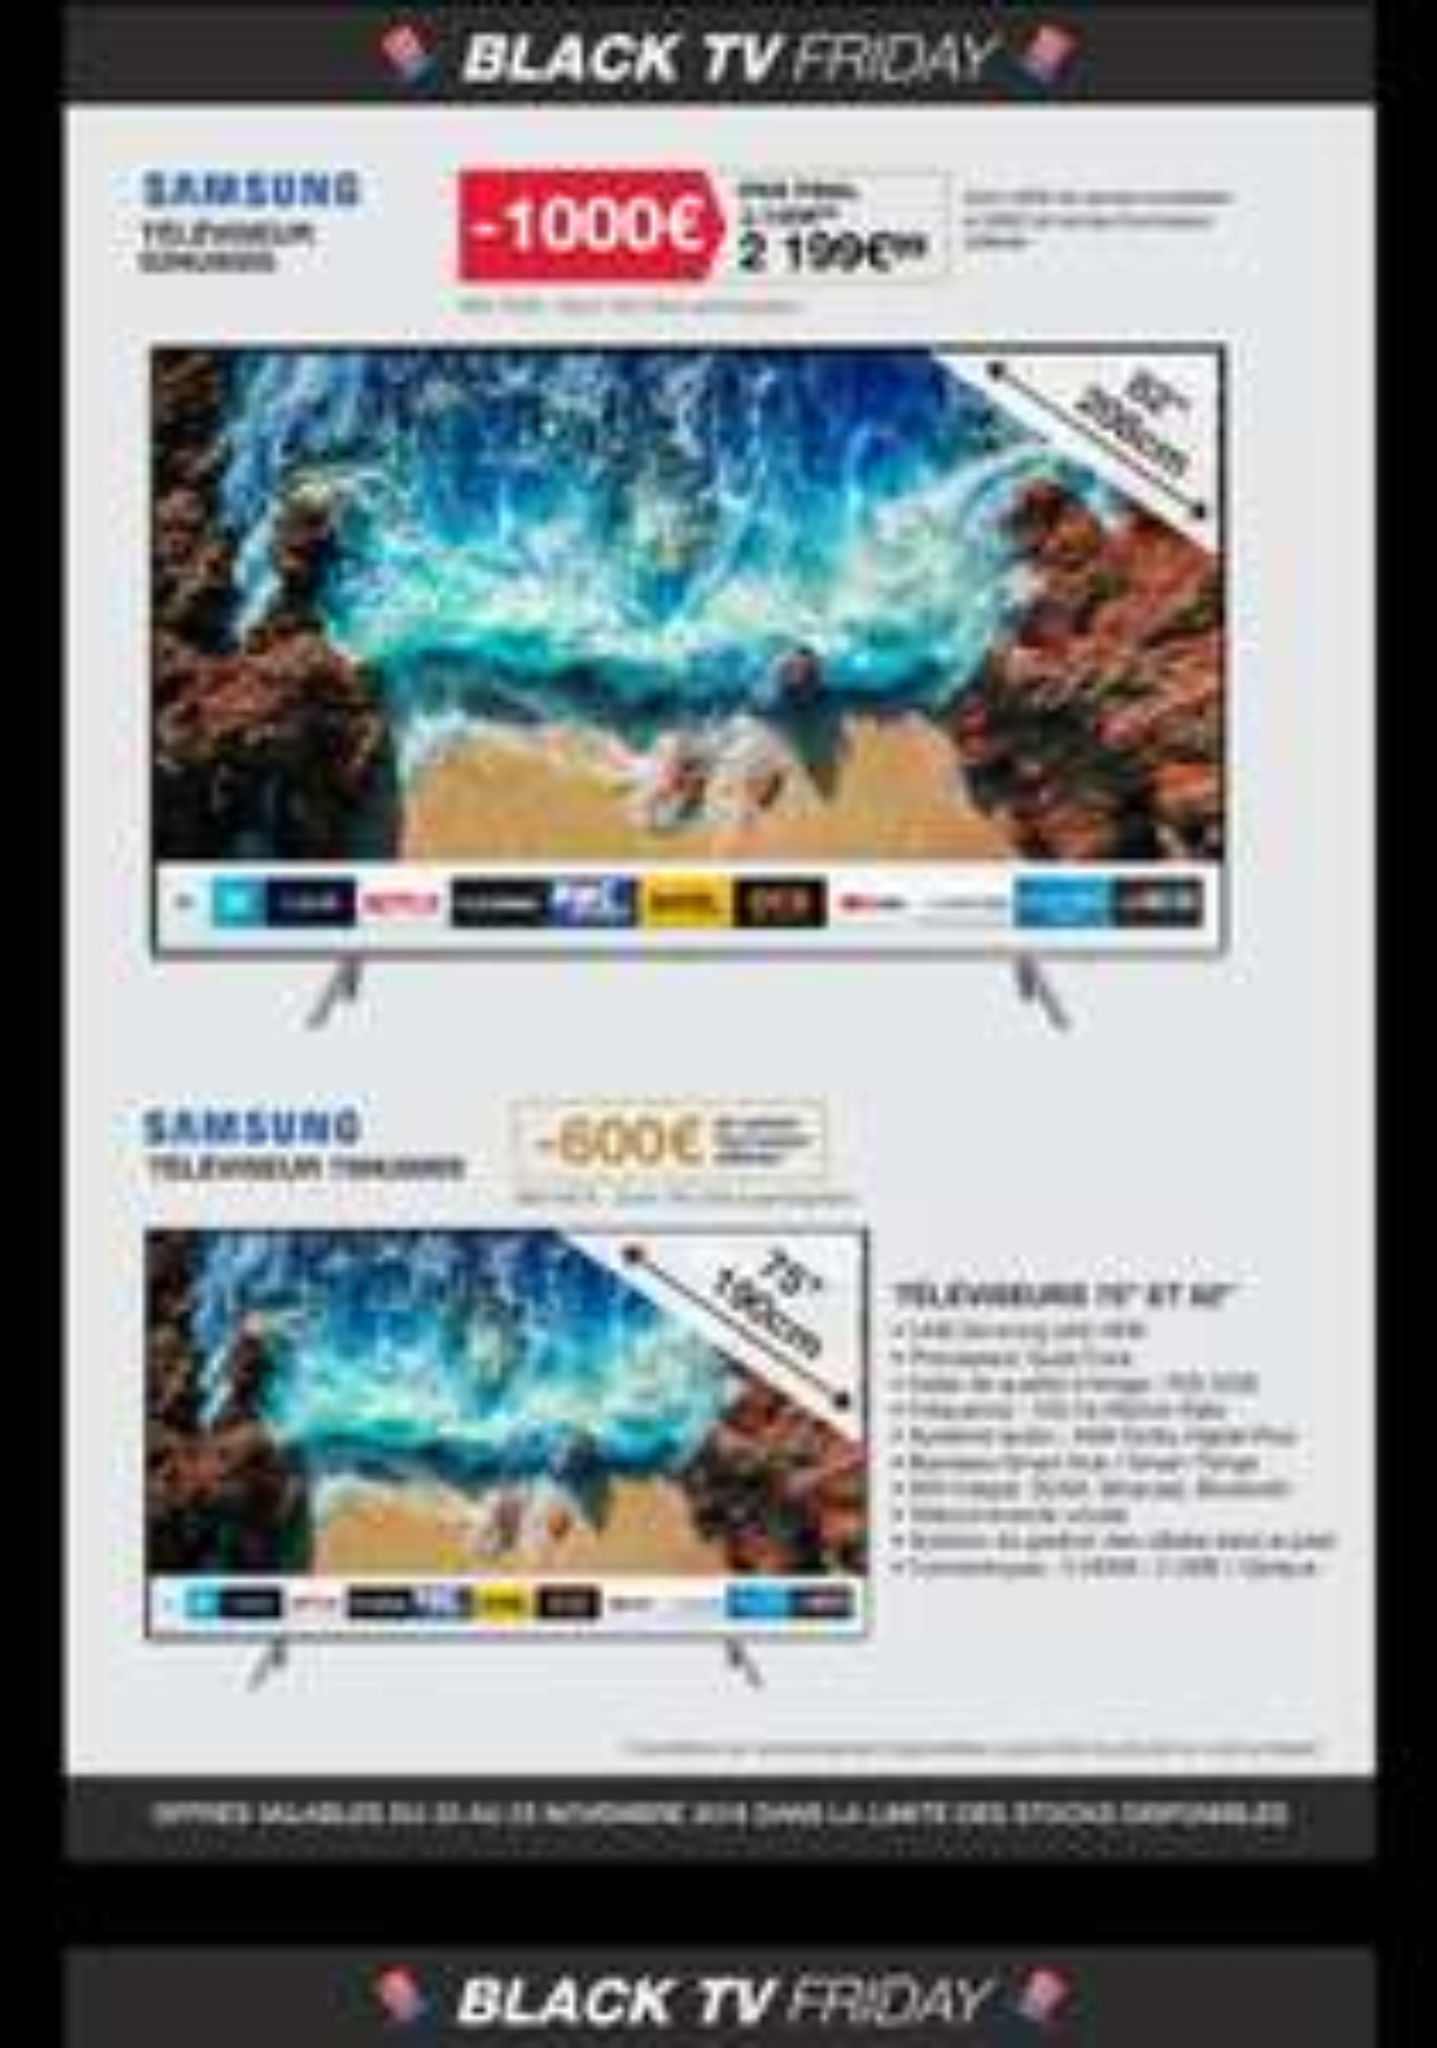 "[Carte Costco] TV 82"" Samsung 82NU8005 - 4k 100Hz"